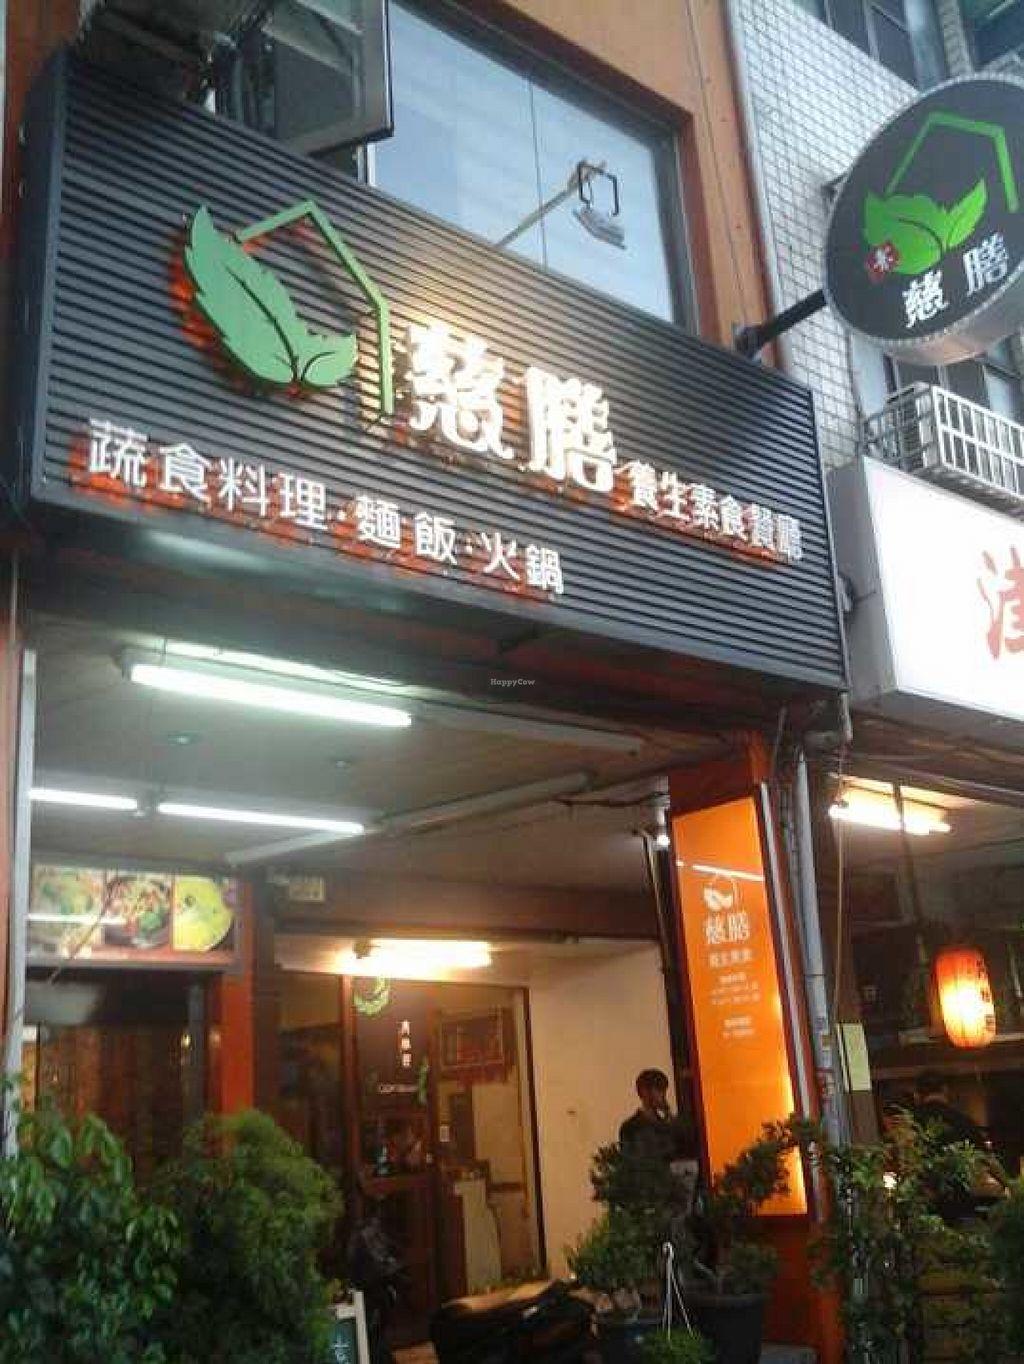 "Photo of Ci Shan Yang Sheng Vegetarian  by <a href=""/members/profile/junya"">junya</a> <br/>Shopfront <br/> May 27, 2016  - <a href='/contact/abuse/image/73520/150978'>Report</a>"